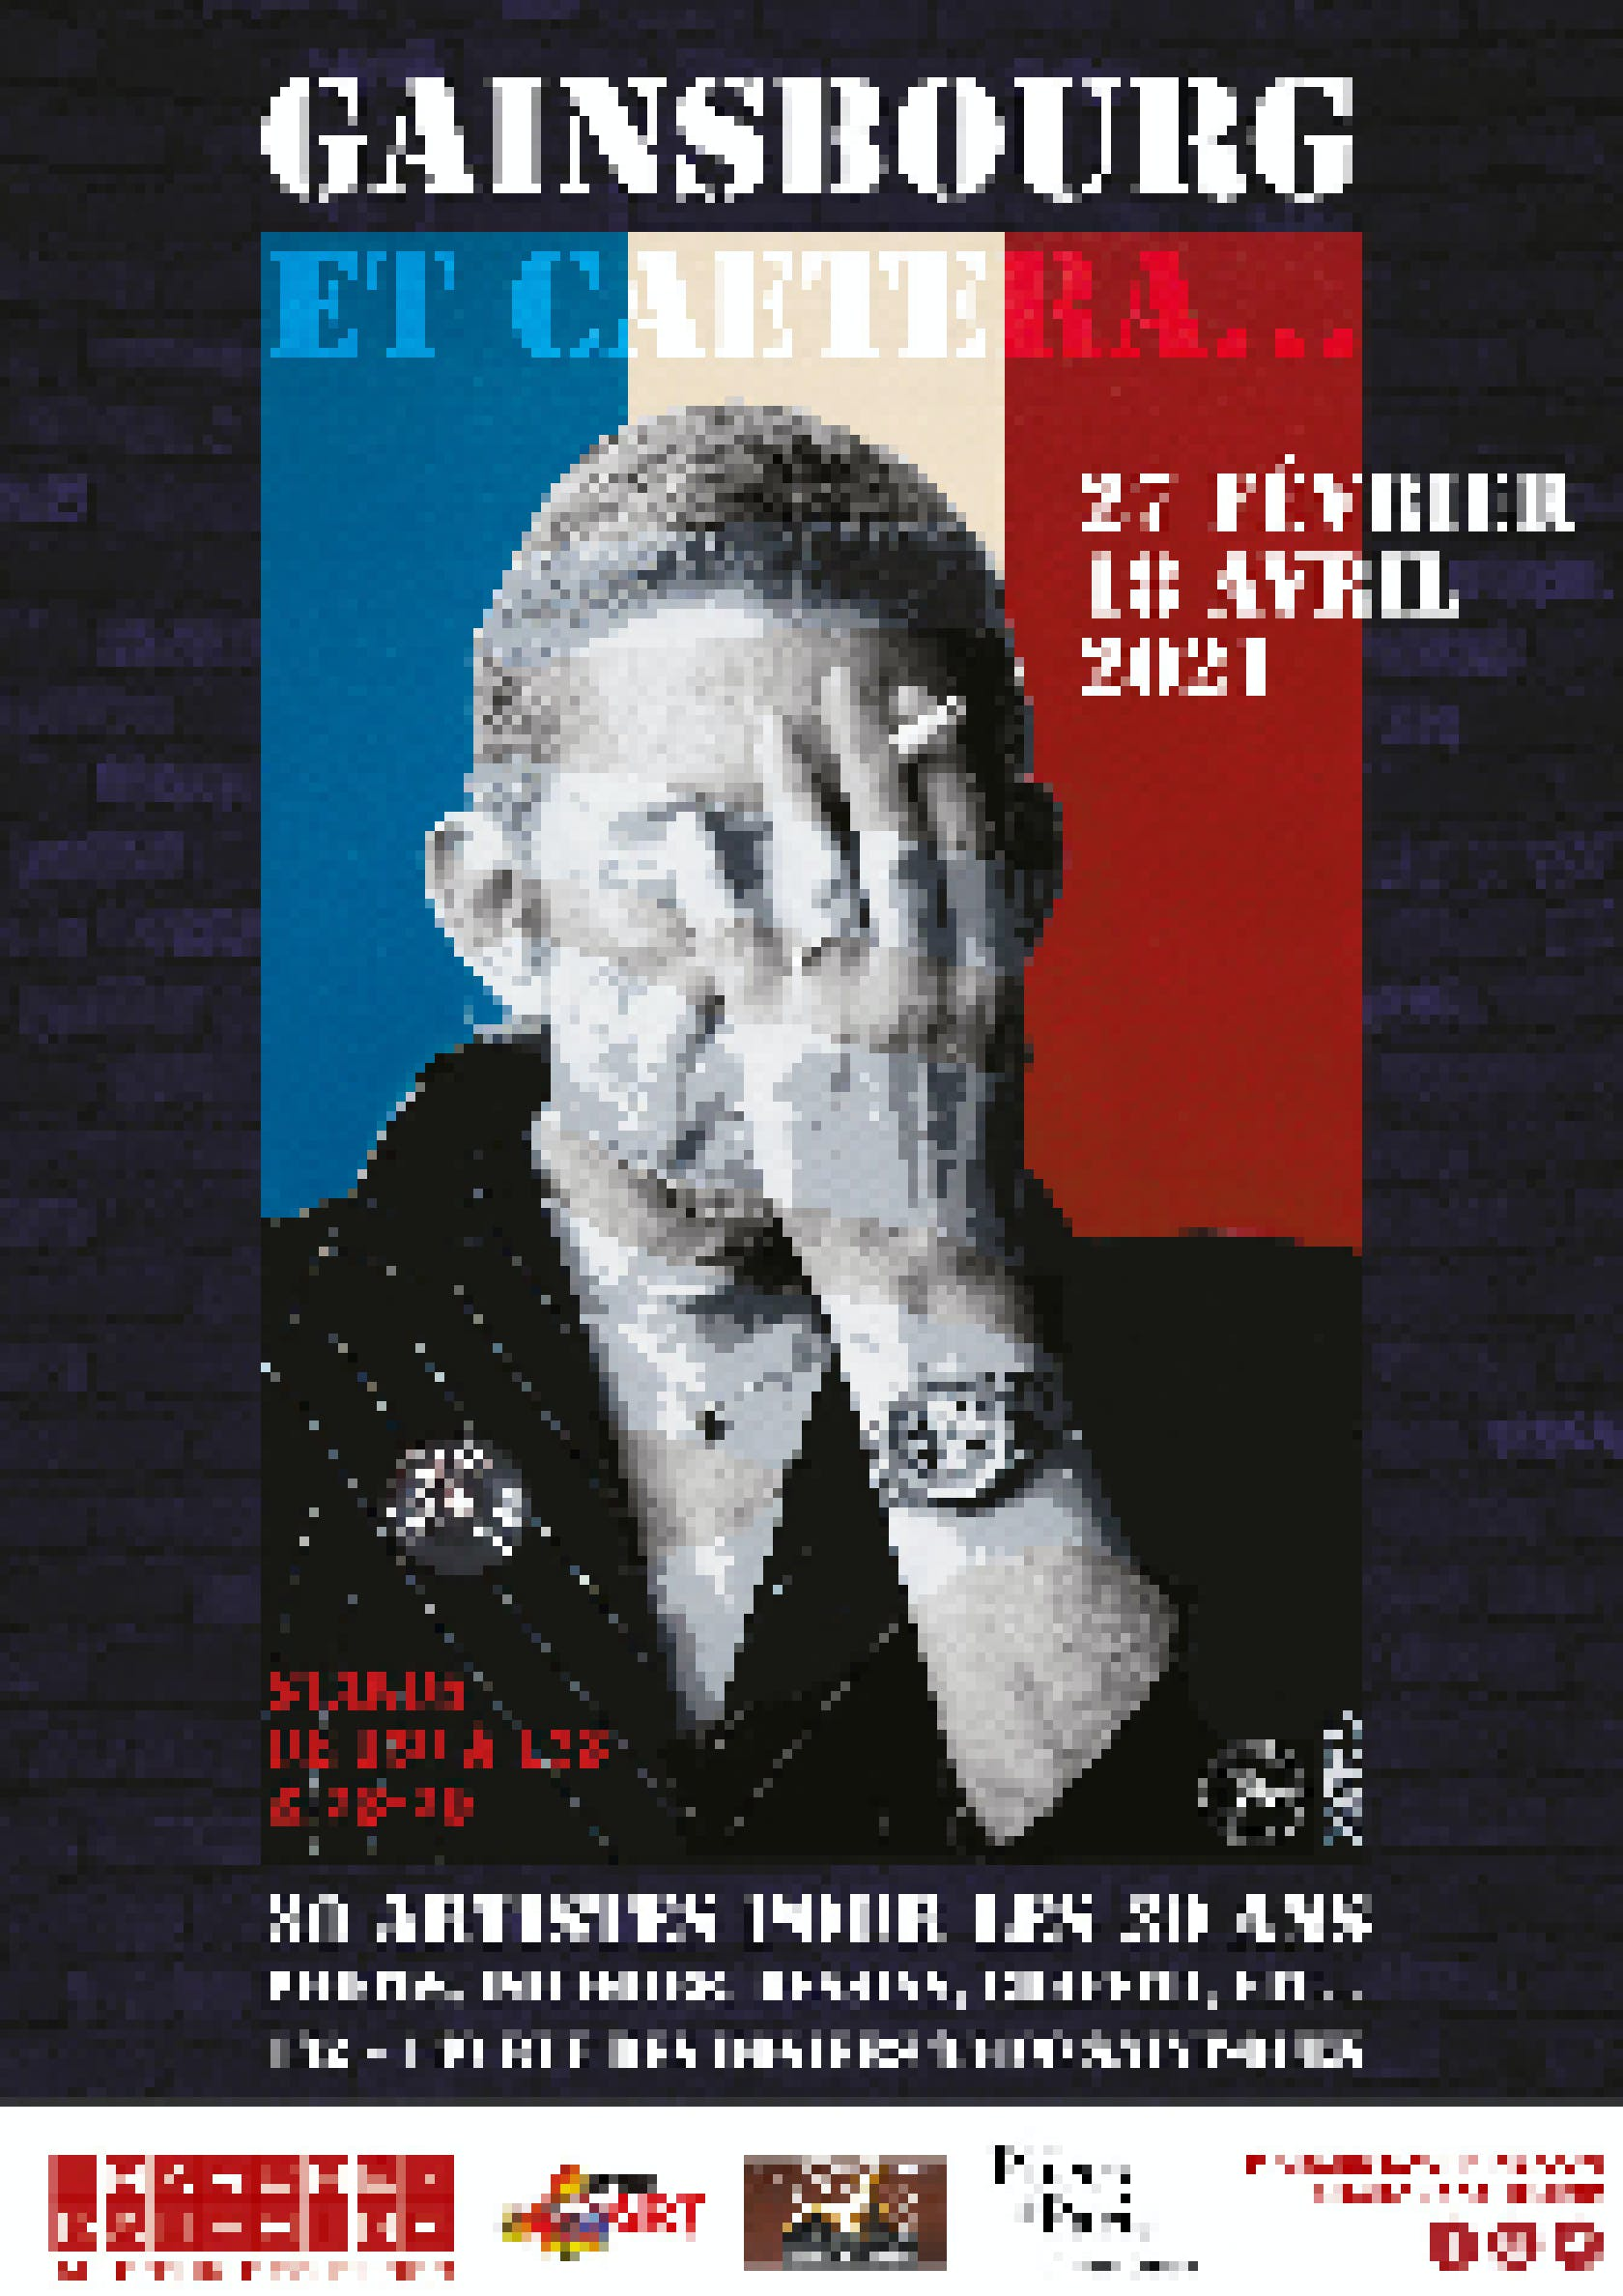 Gainsbourg et caetera - Marché Dauphine